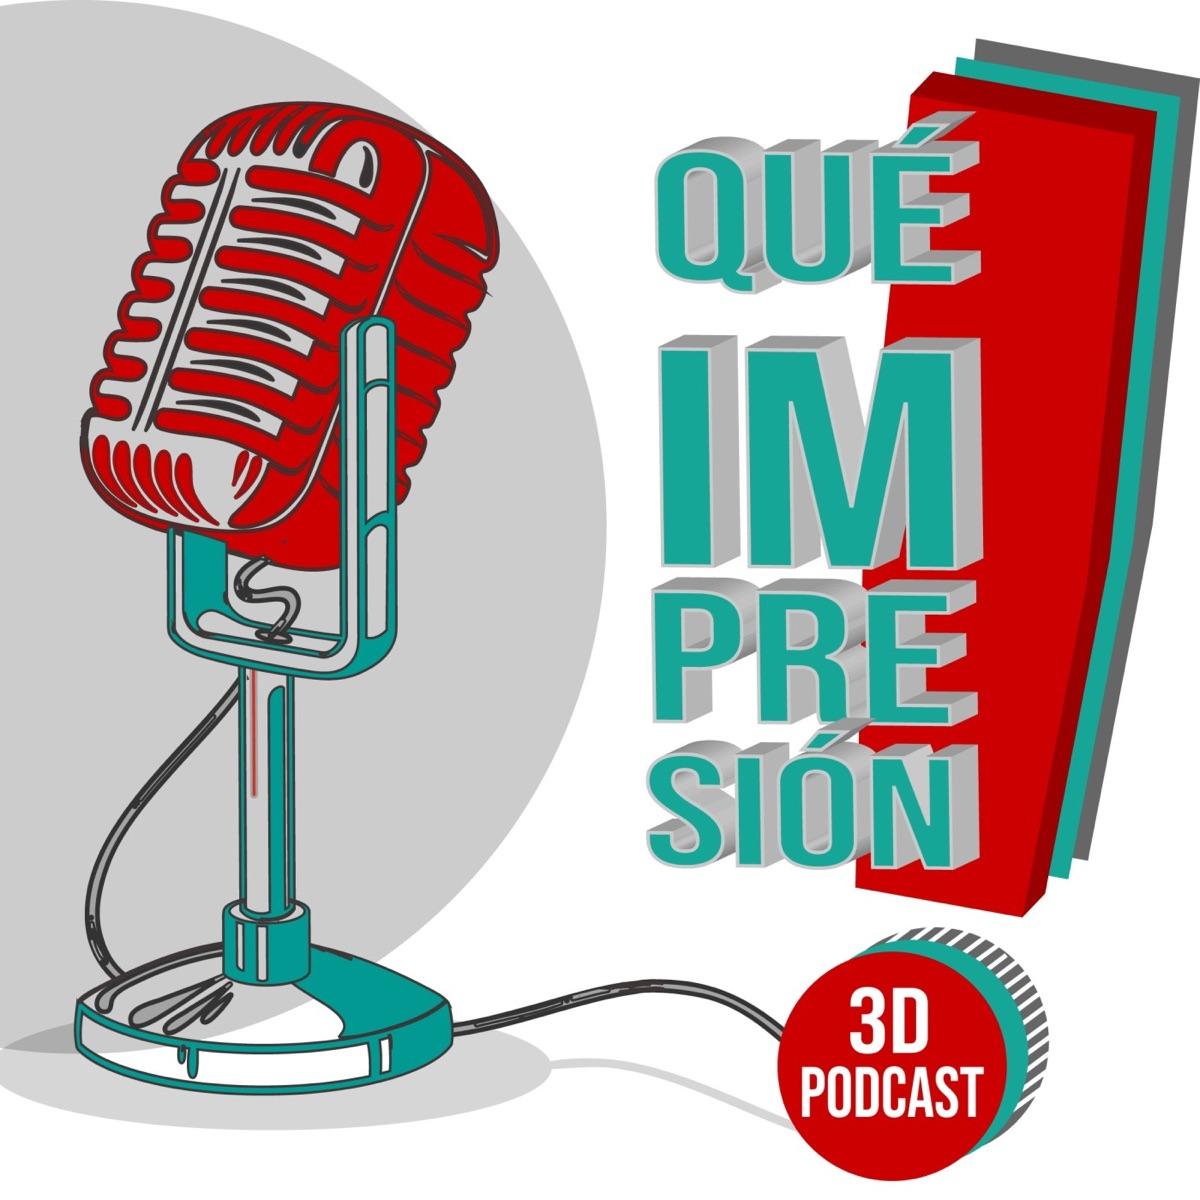 ¡Qué Impresión! Podcast 3D